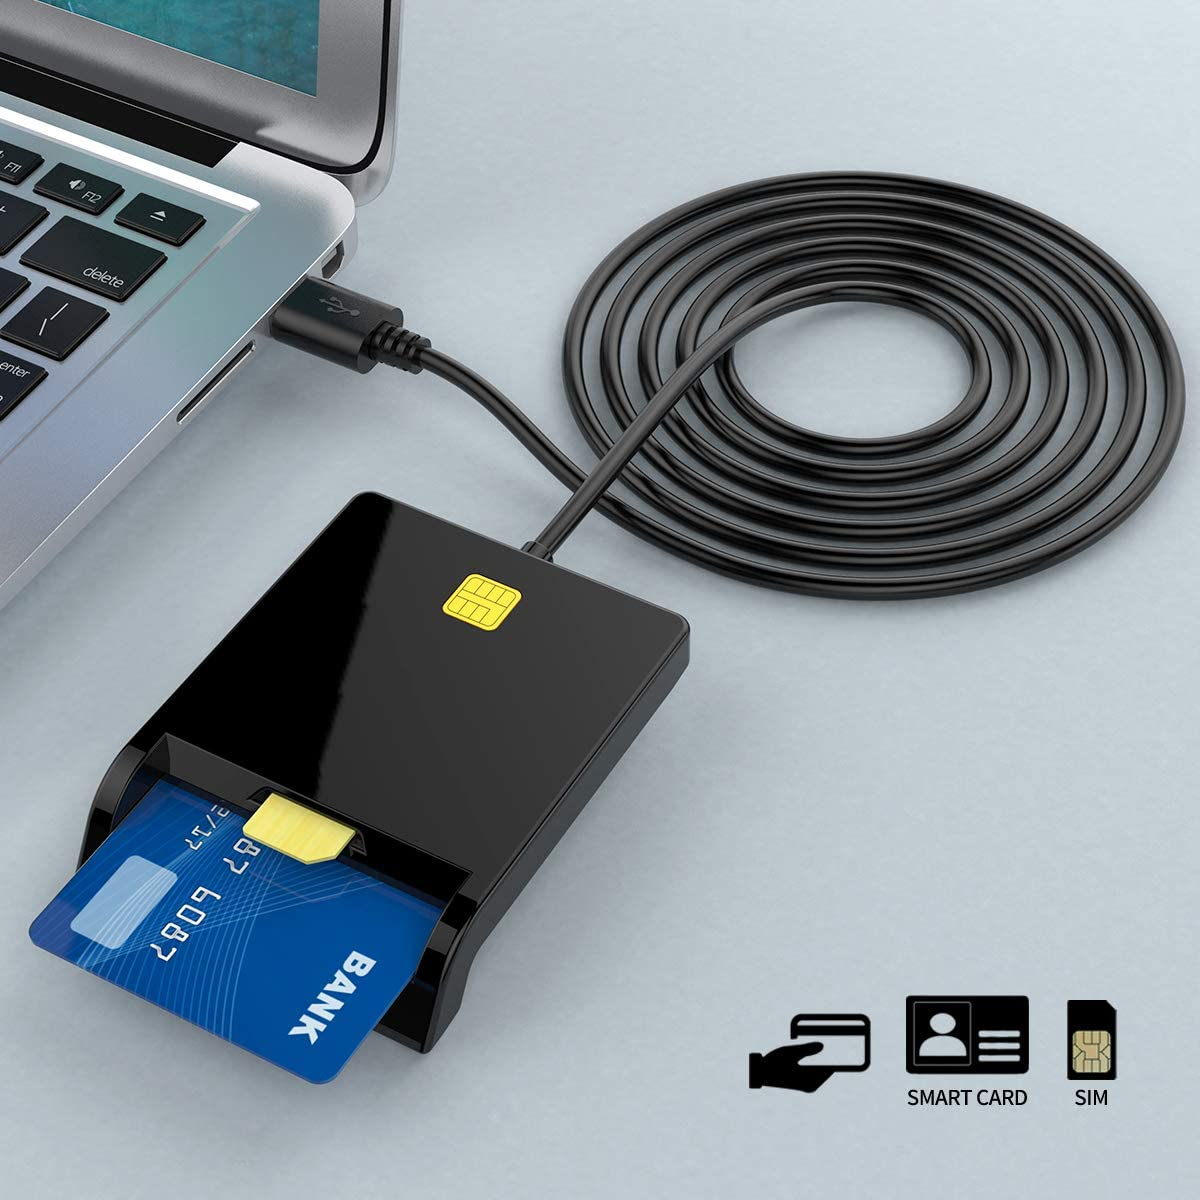 ISO7816 ID card reader EMV USB IC credit card chip reader writer - USBSKY   USBSKY.NET